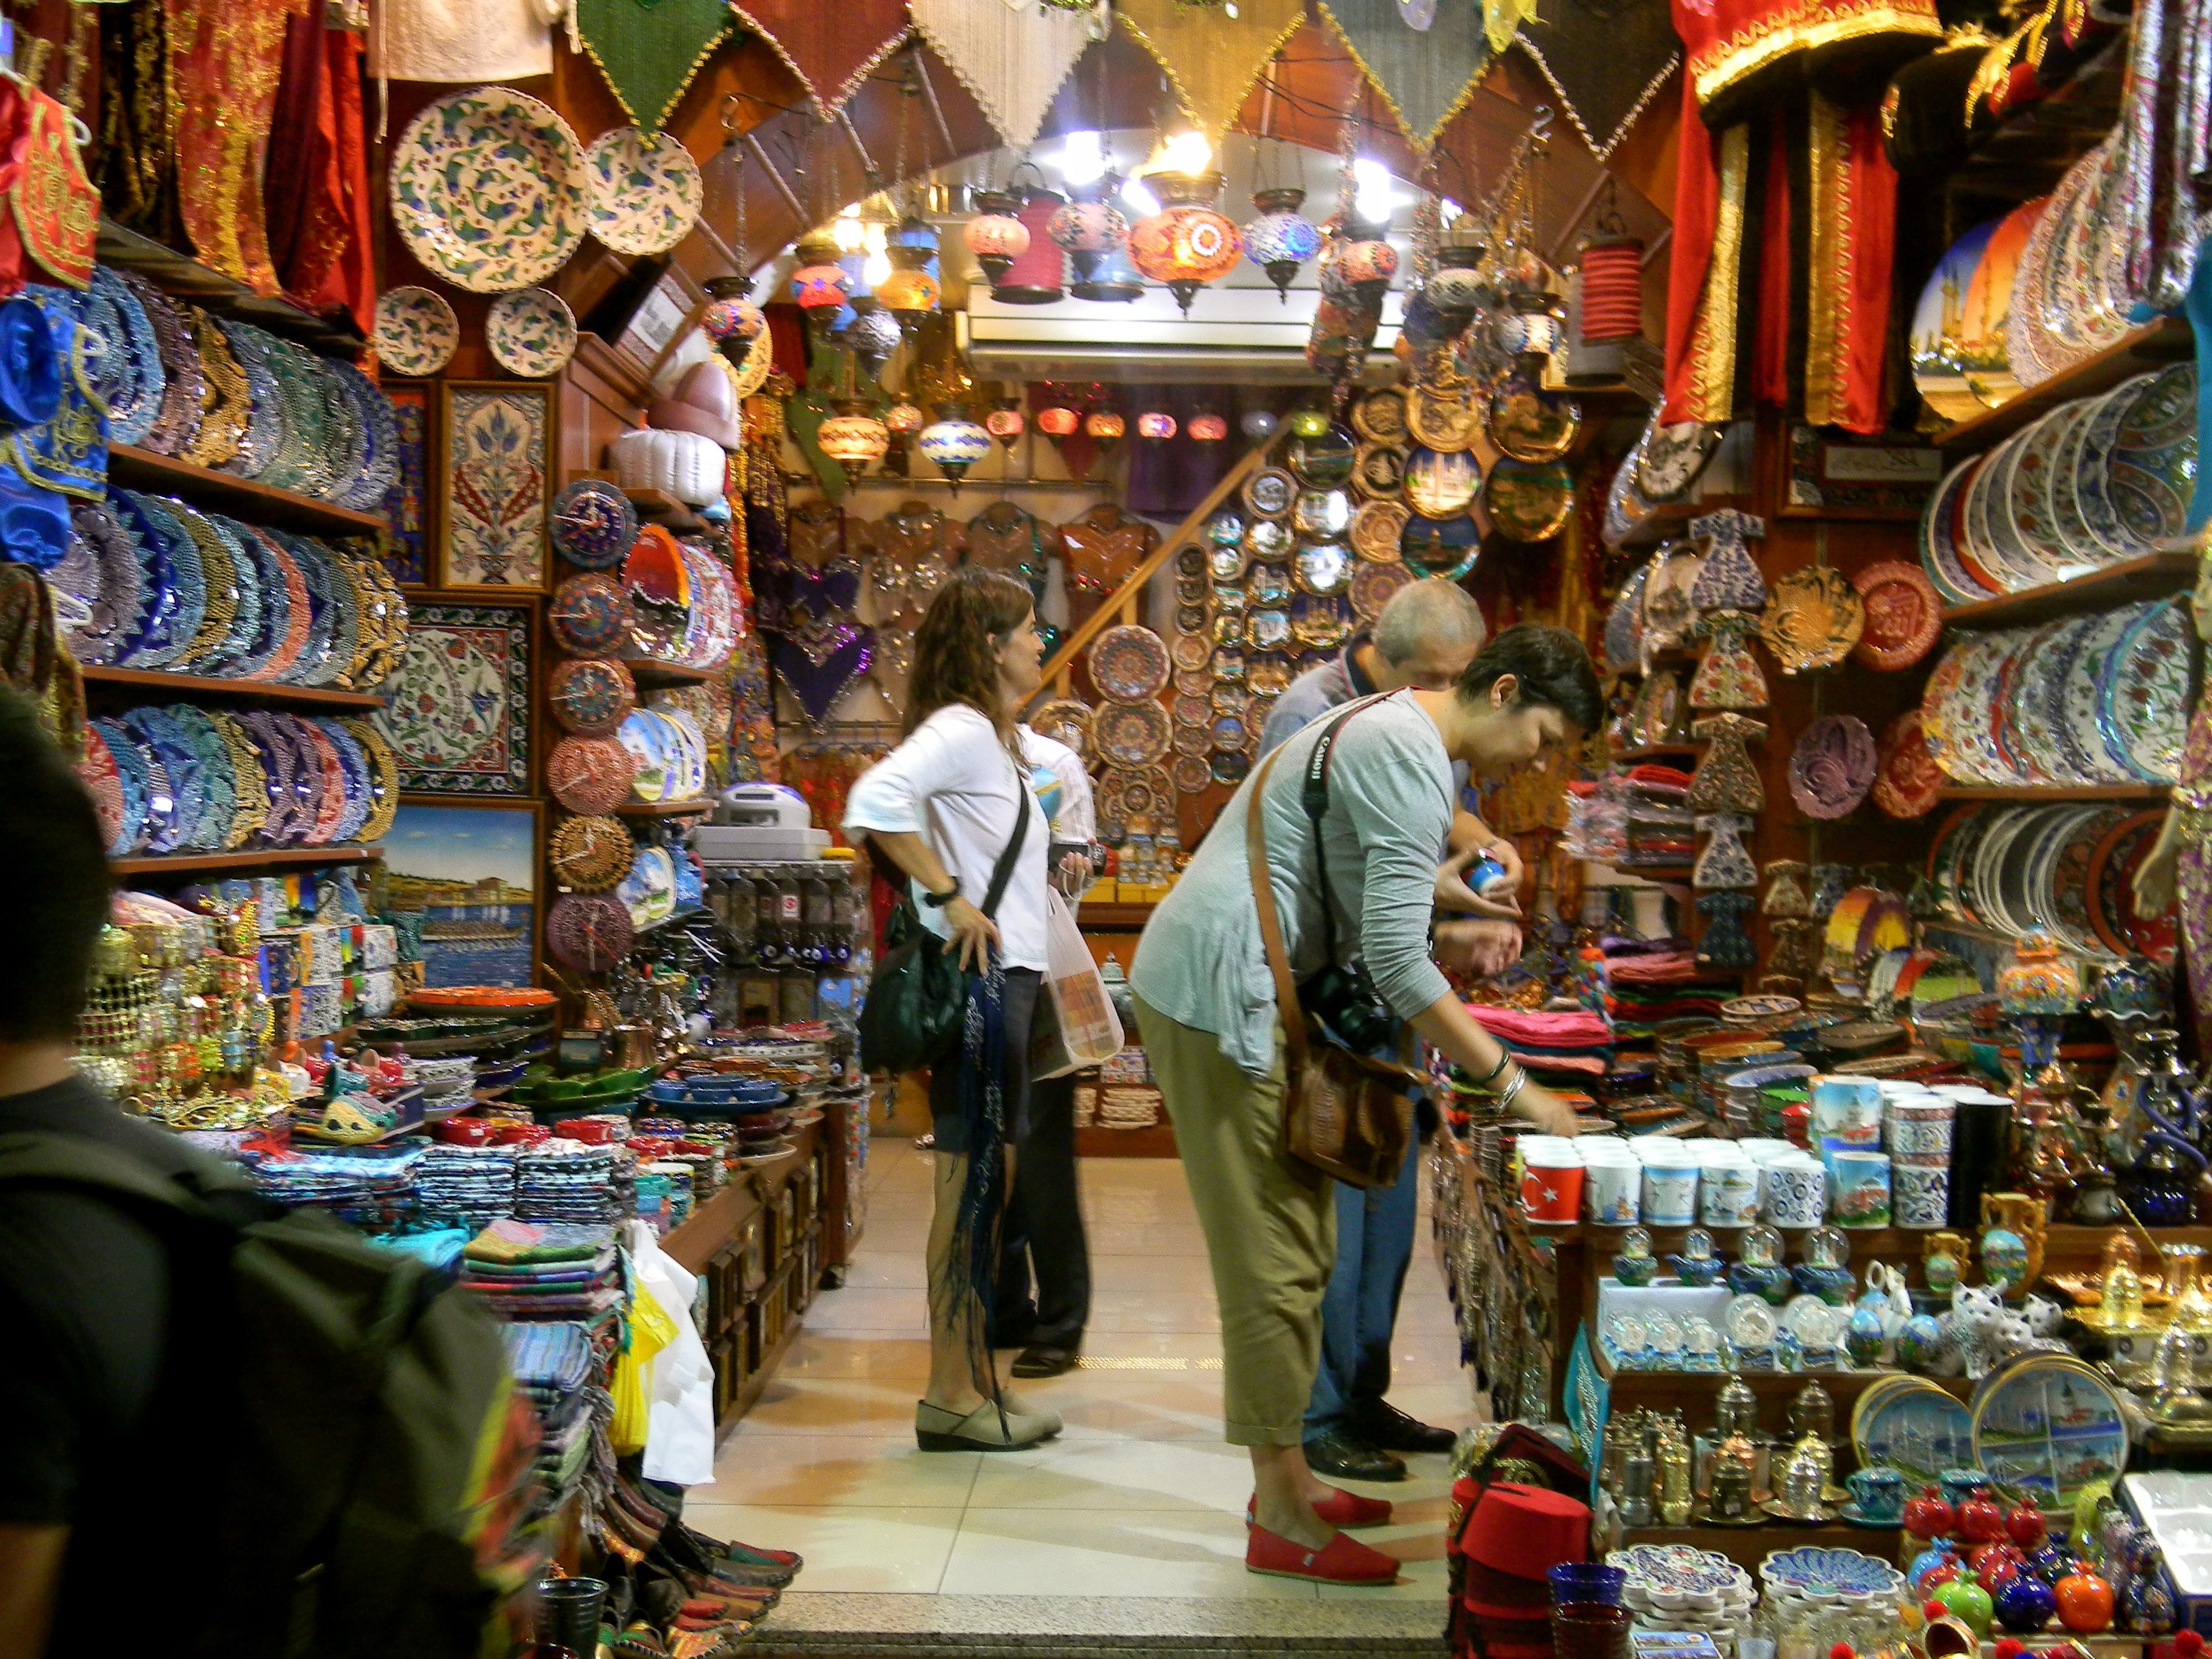 Spice Bazaar, Istanbul | Istanbul, Antalya, Turkey travel